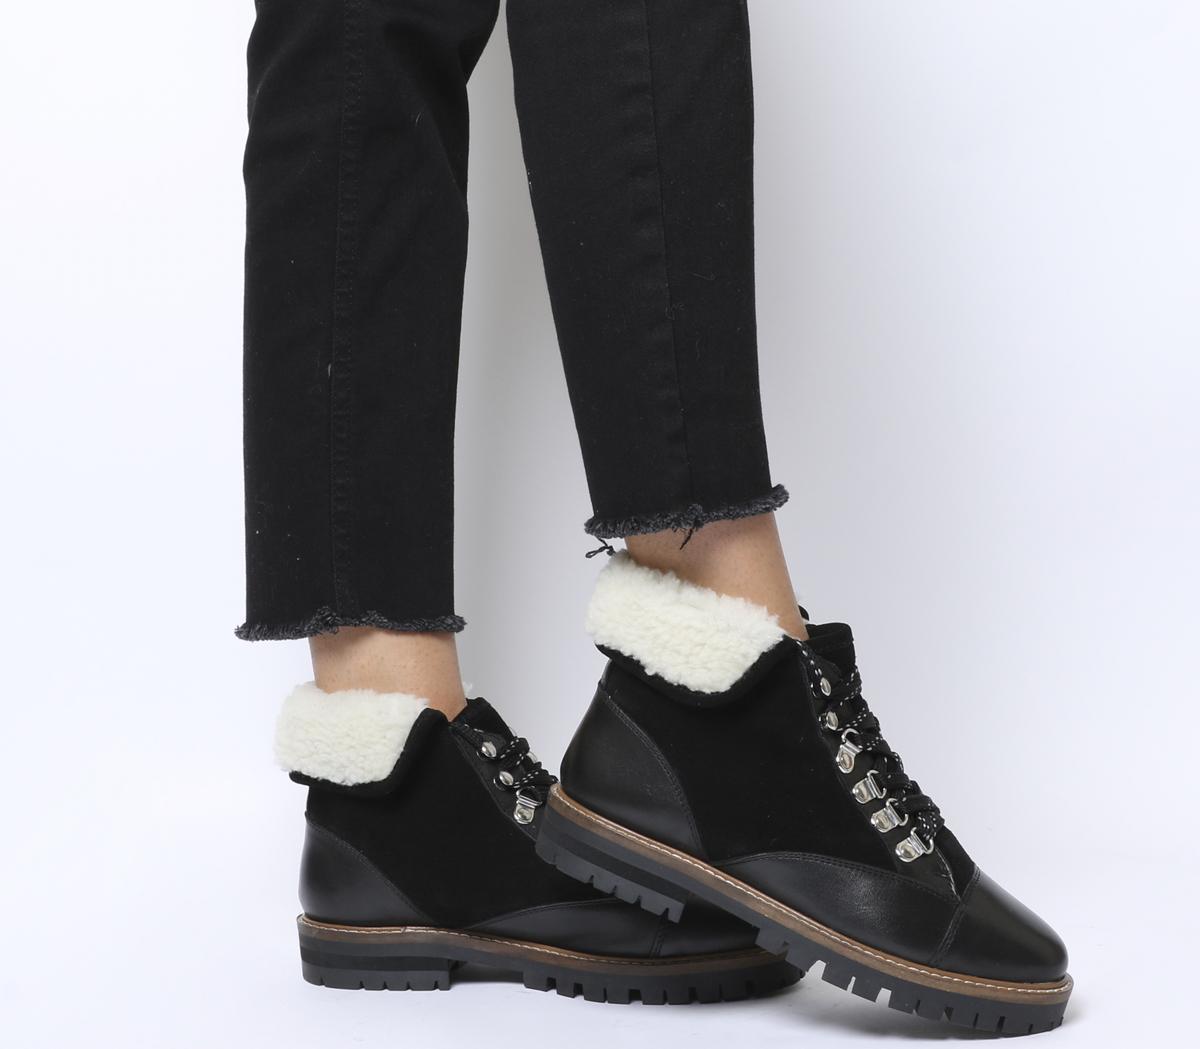 Office Adams Furline Hiker Boots Black